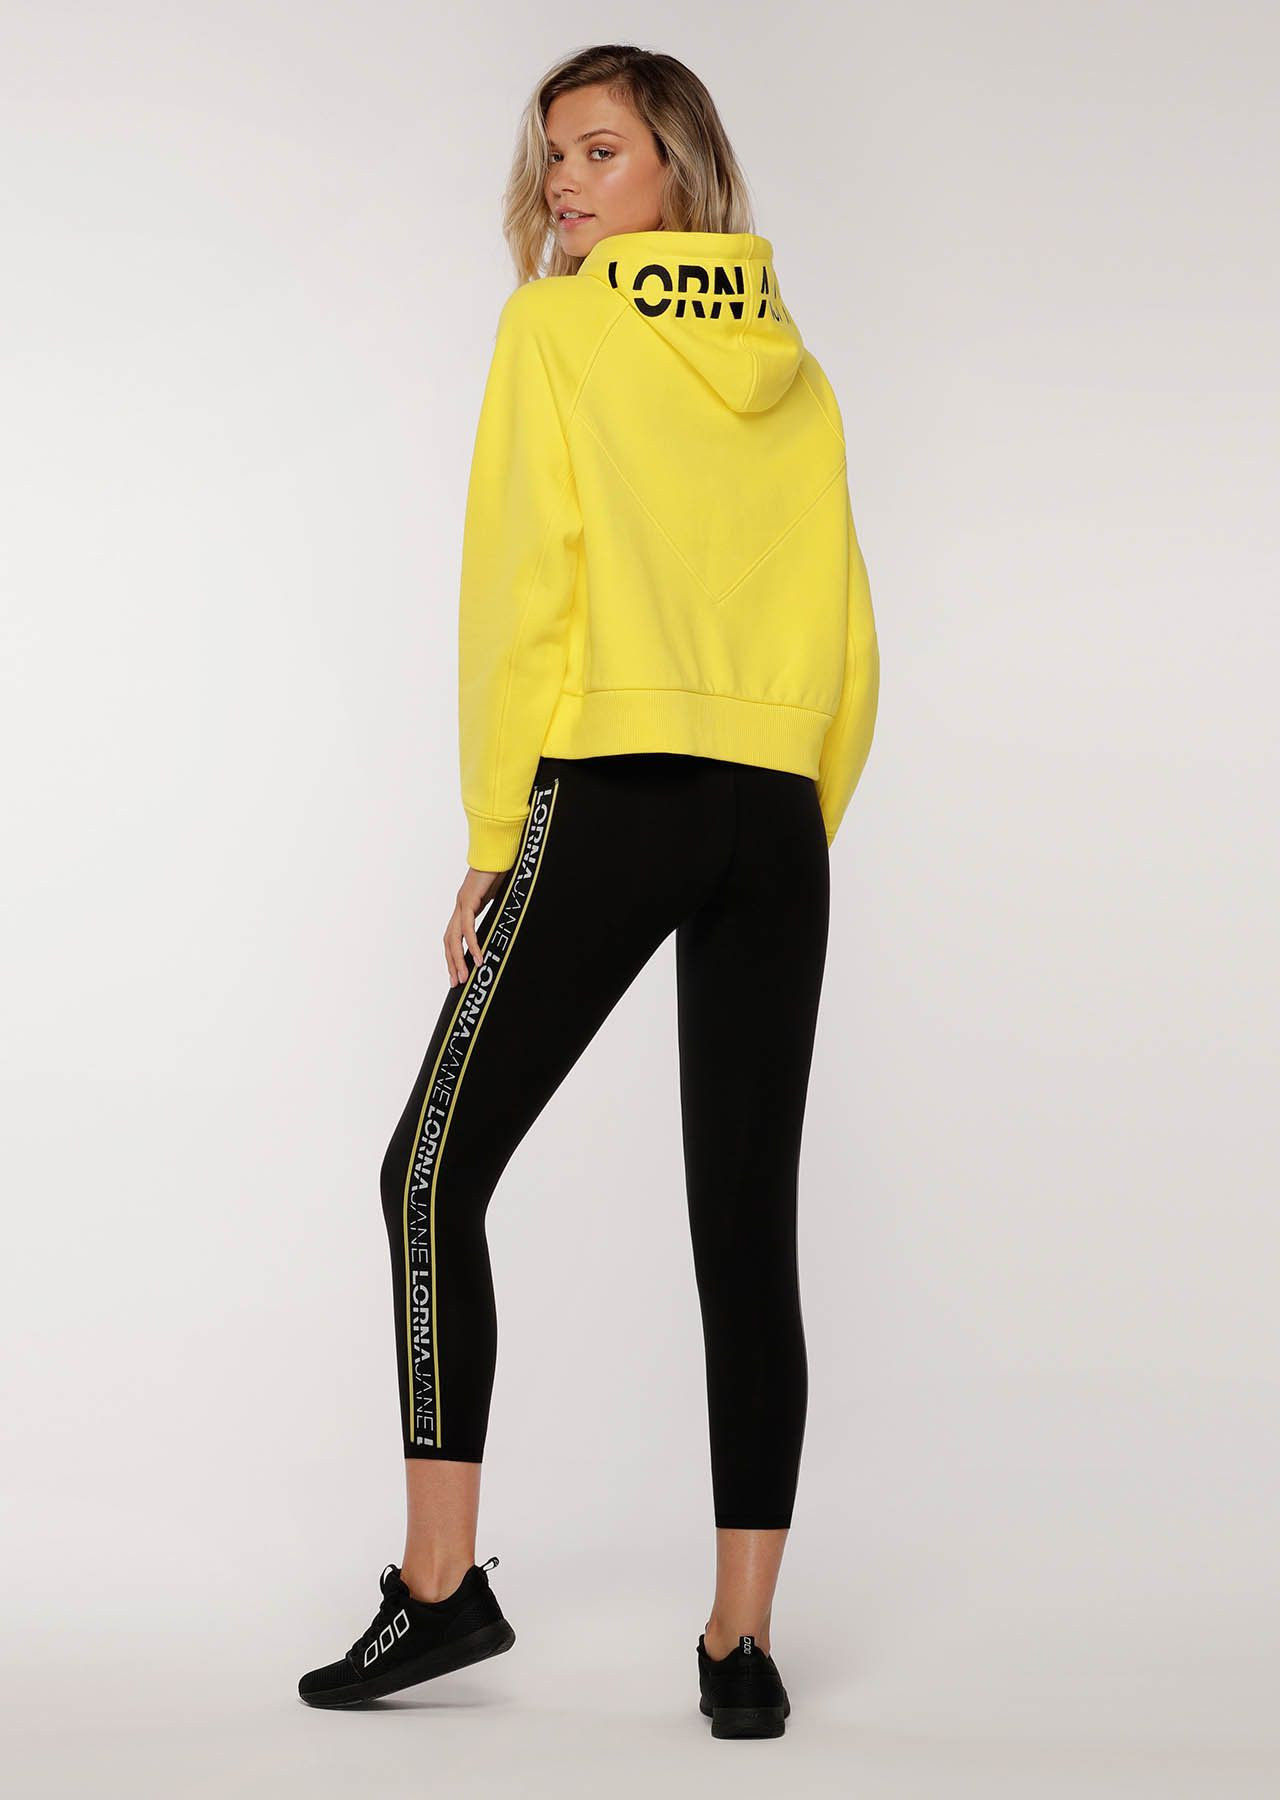 Pin on Wear It fitness fashion